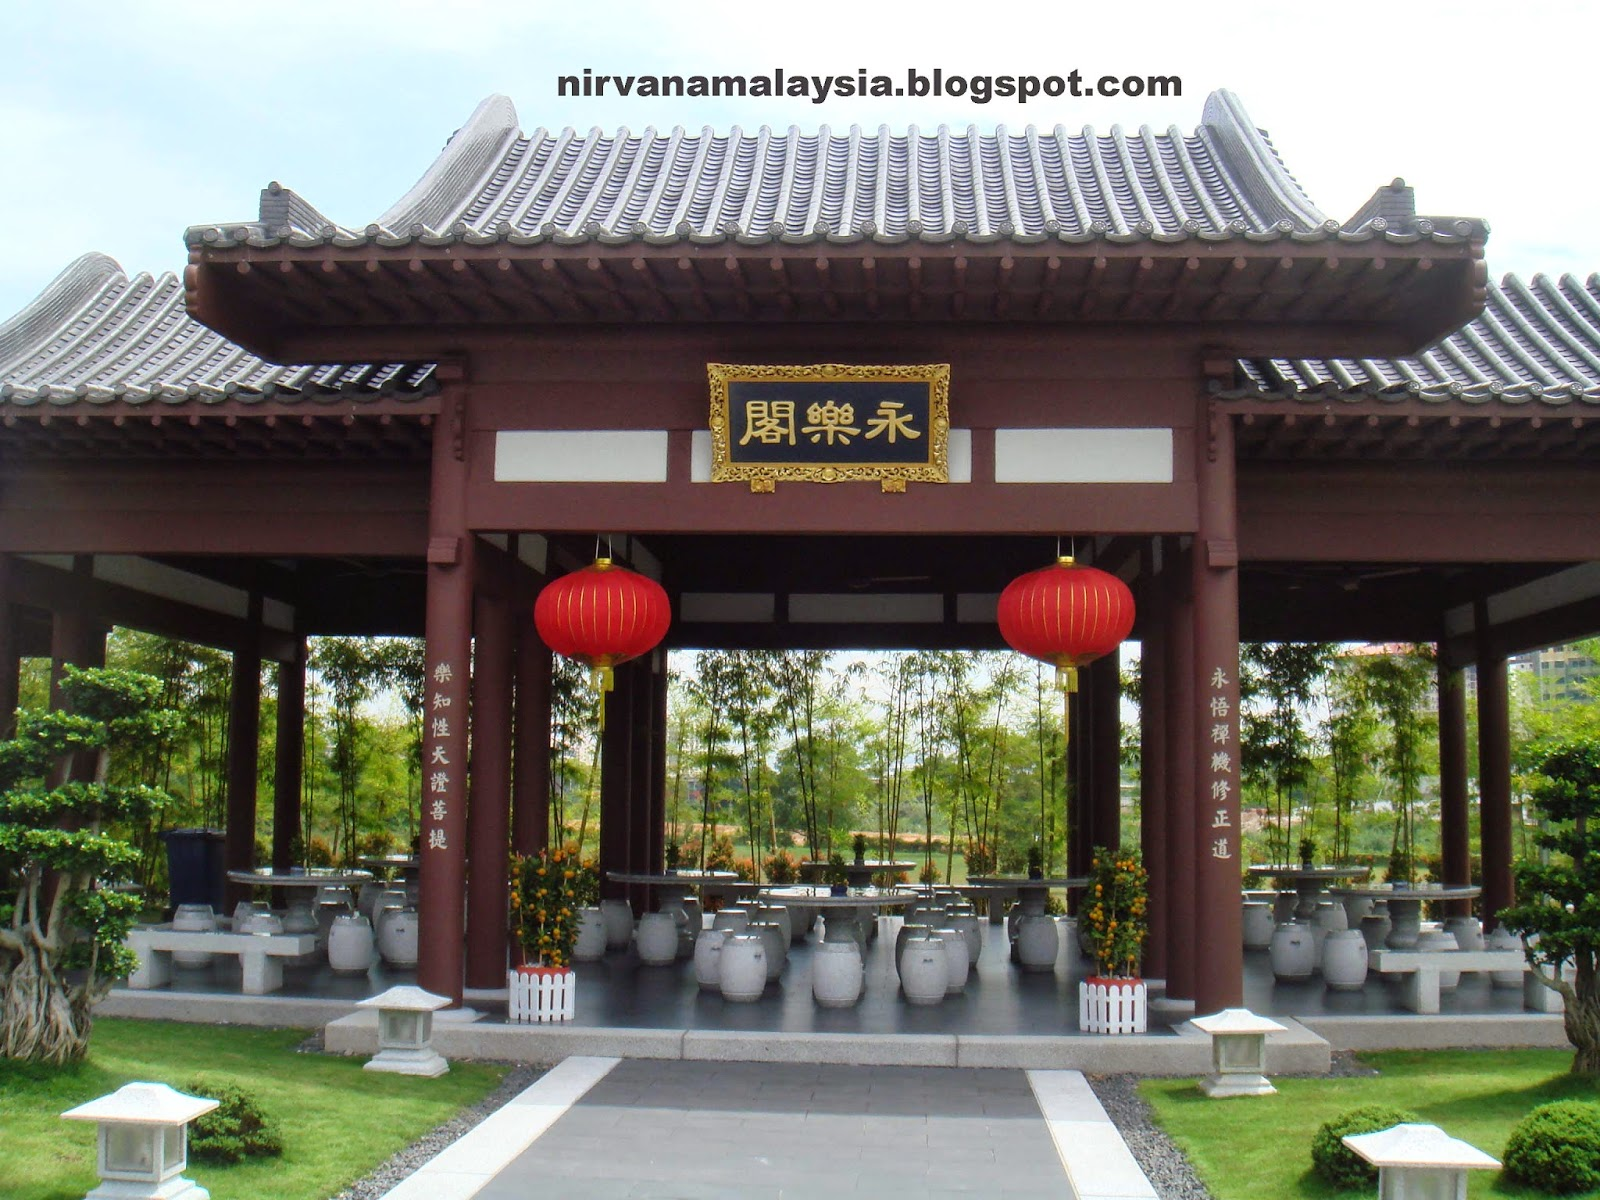 富貴山莊 | nirvana | nirvana funeral package | nirvana promotions